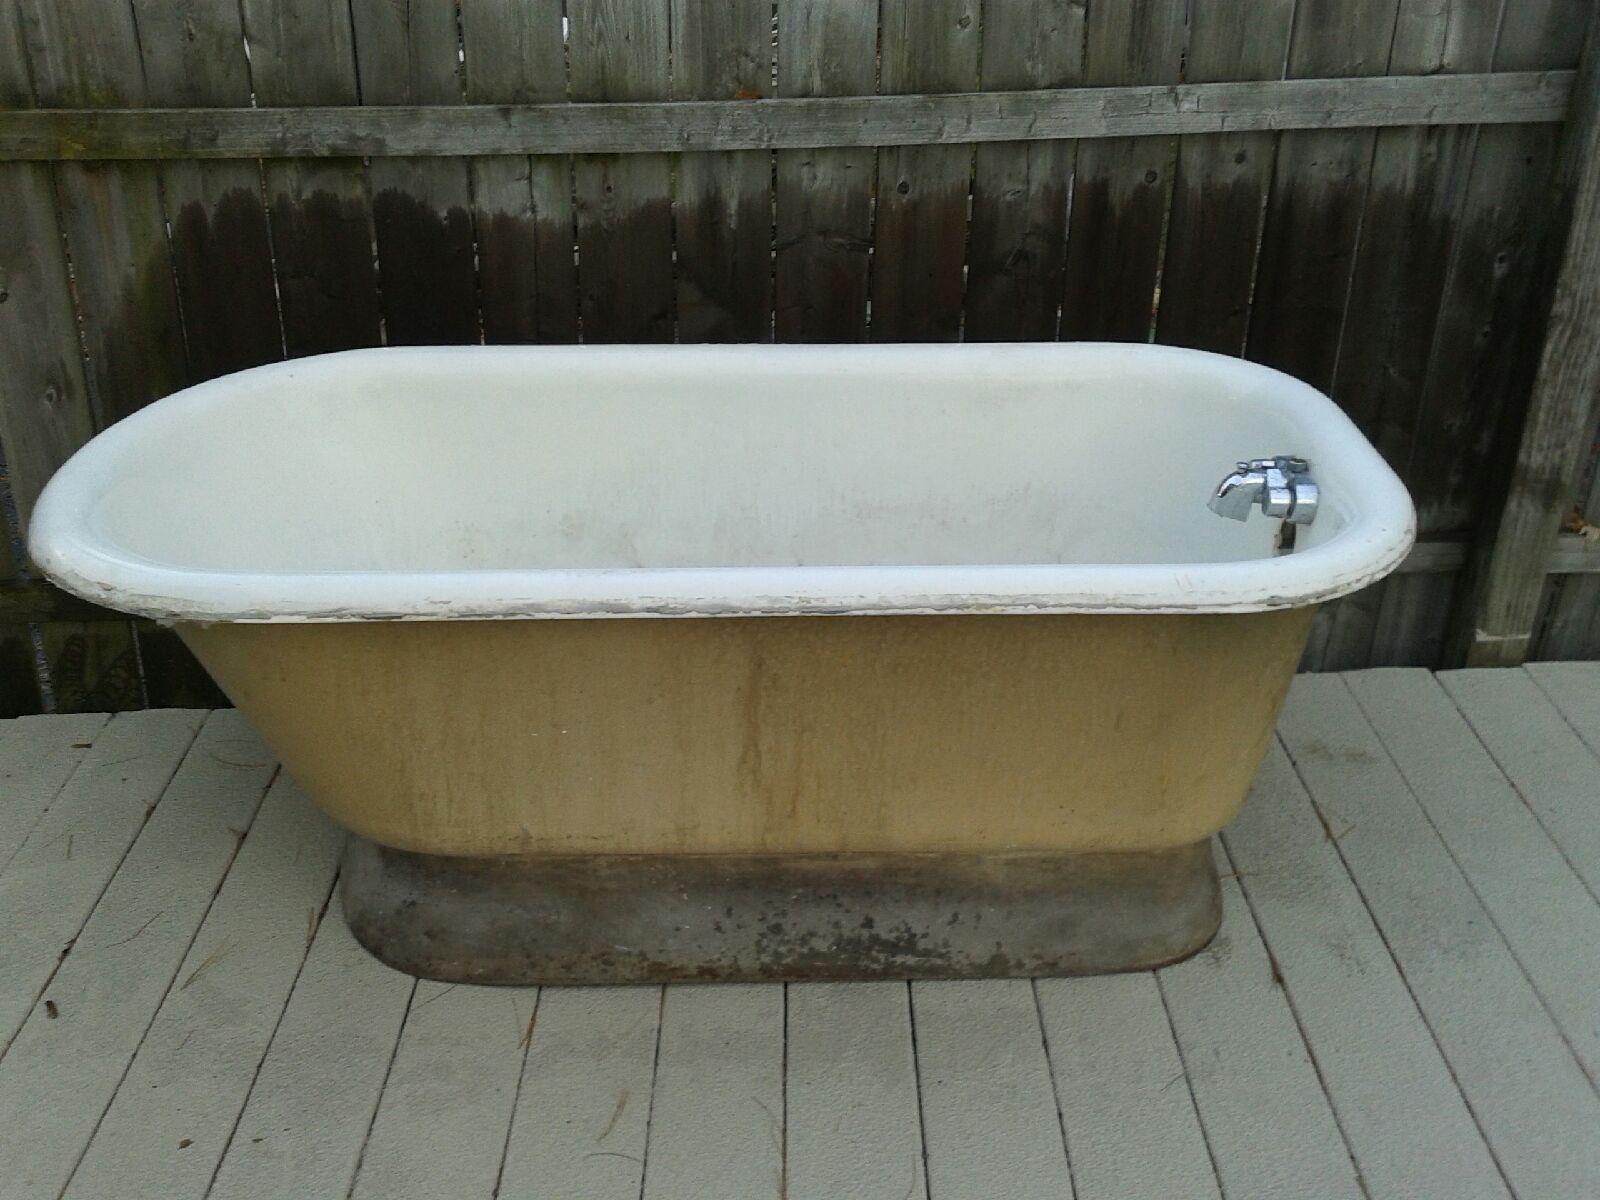 99 Galvanized Bathtub For Sale